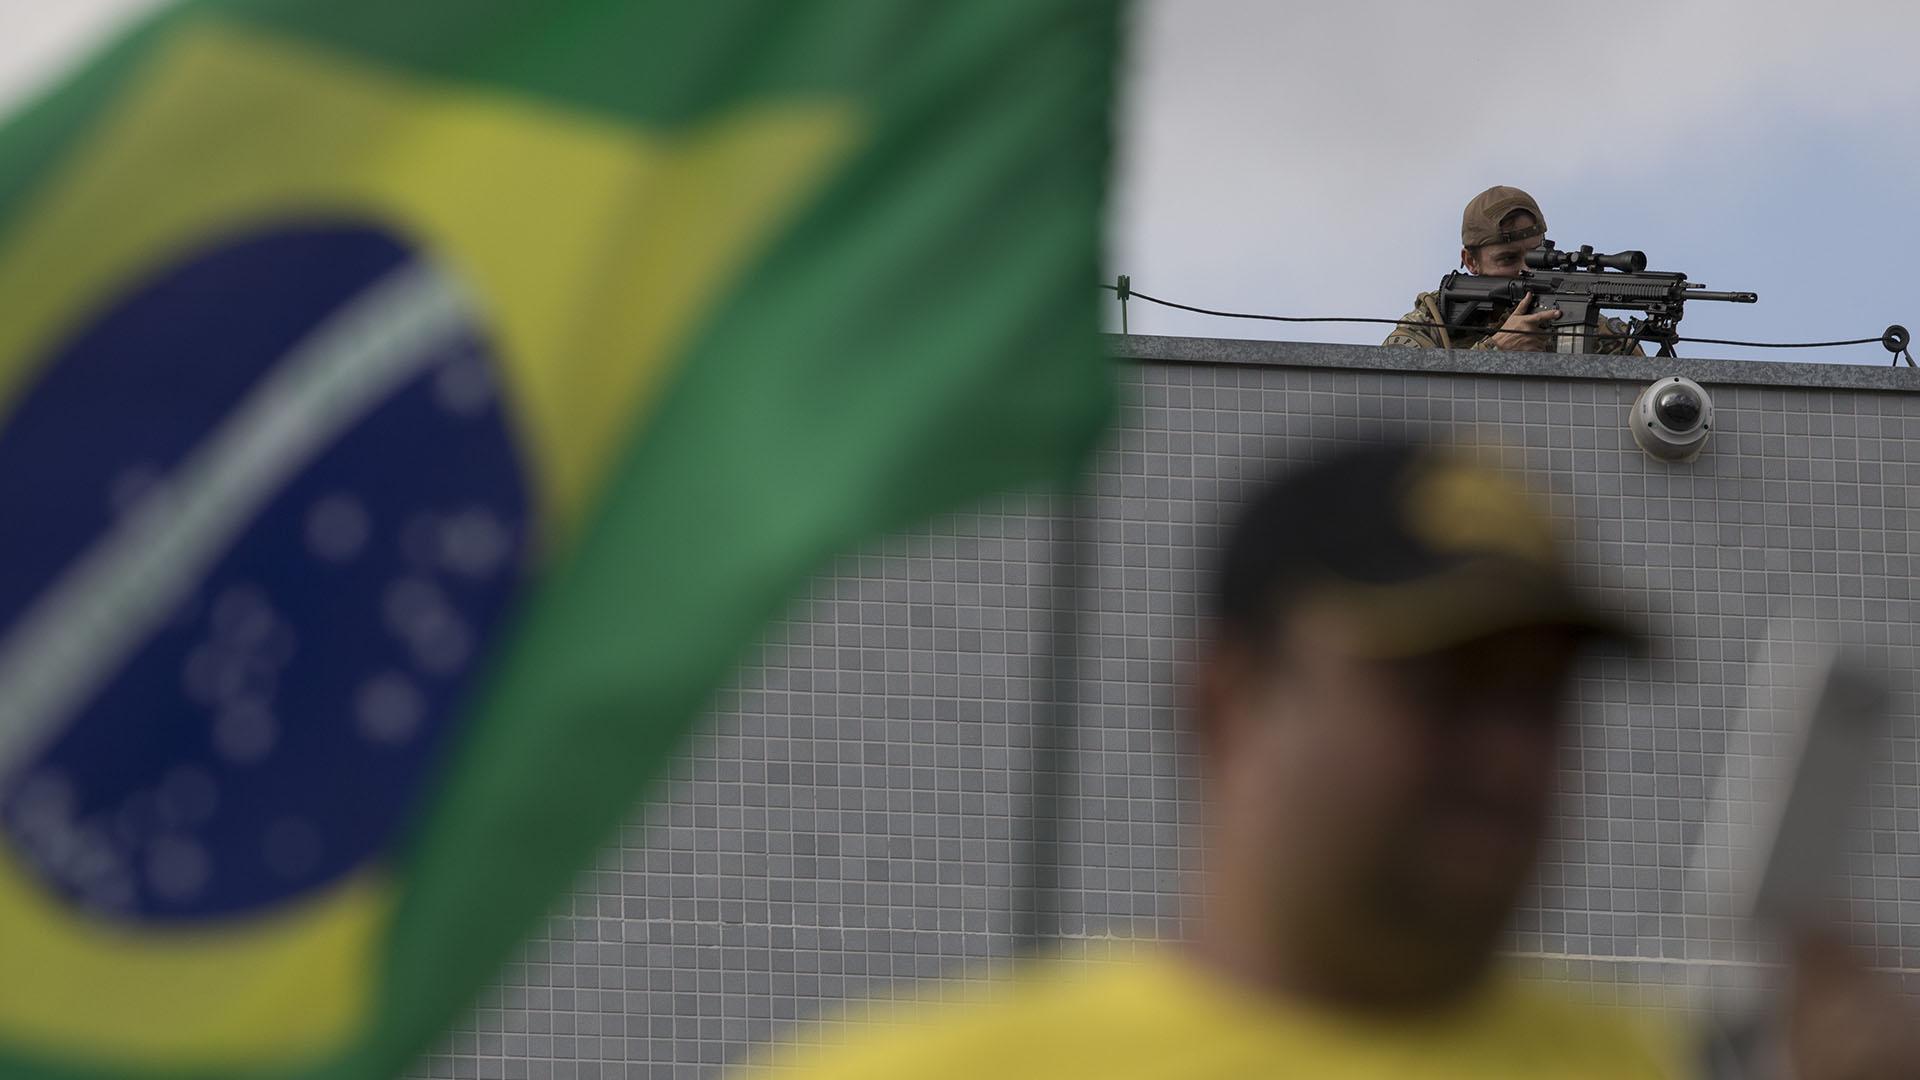 Curitiba. (AP Photo/Leo Correa)